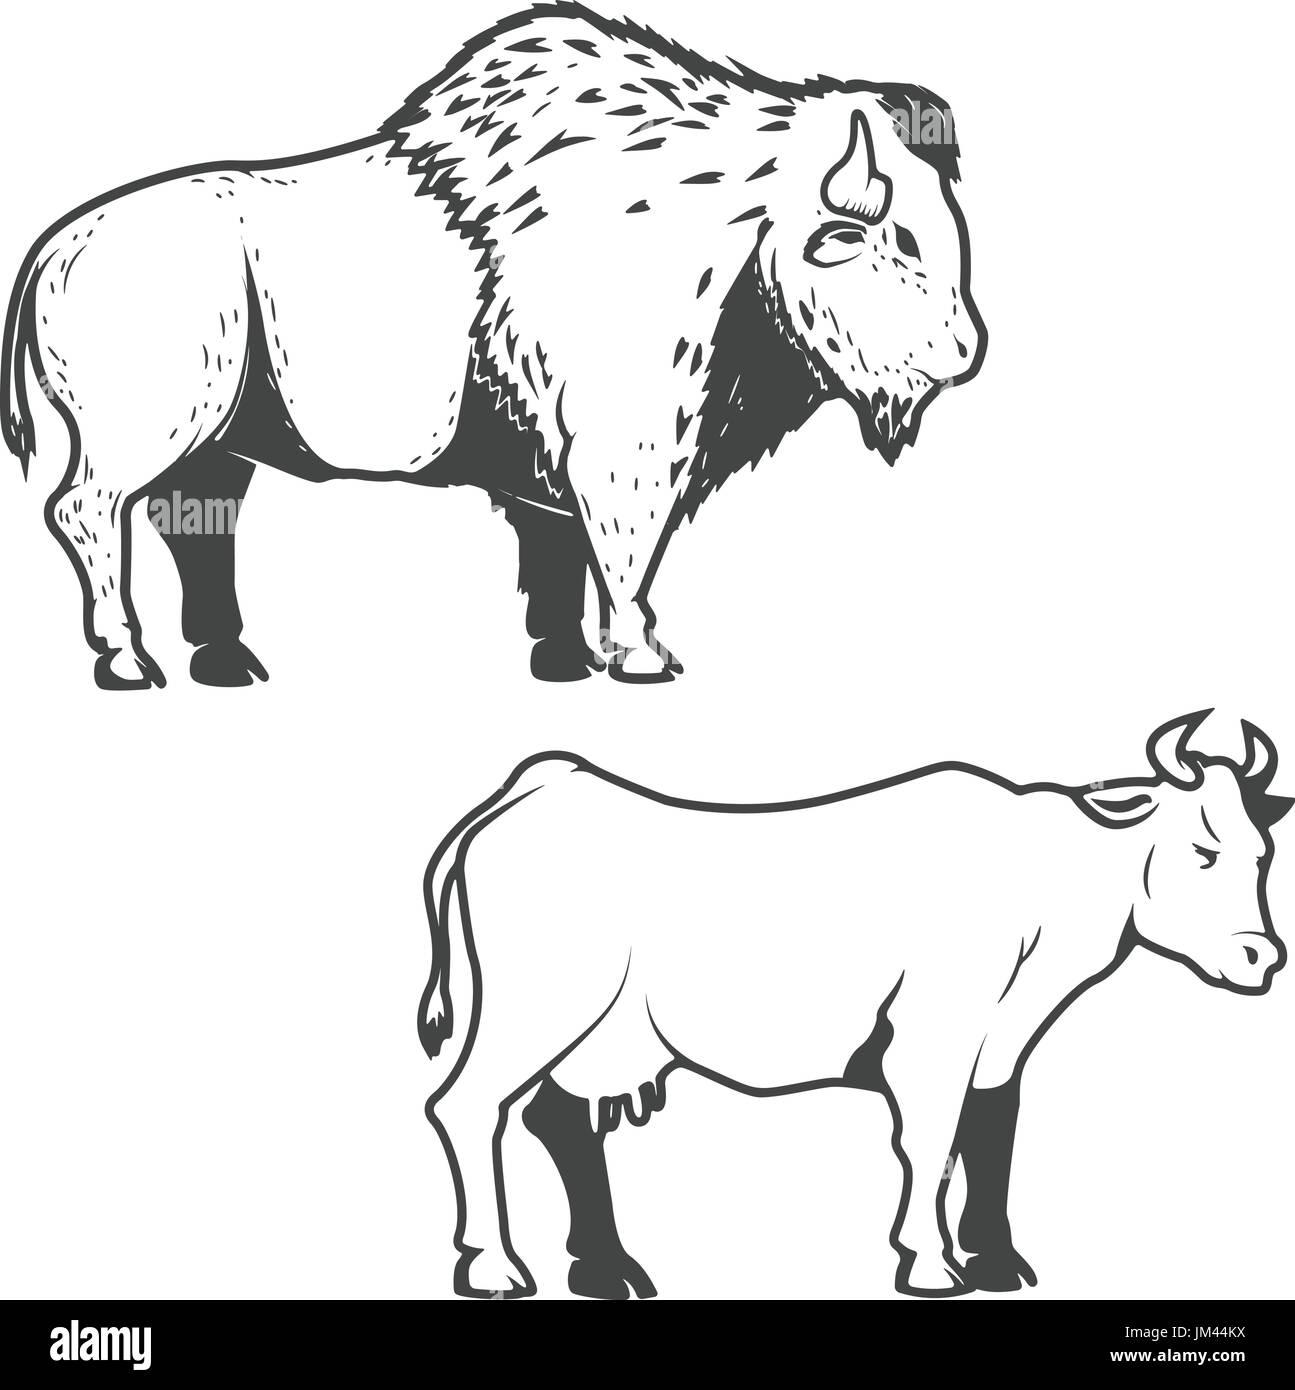 Black White Cartoon Illustration Ox Imágenes De Stock & Black White ...